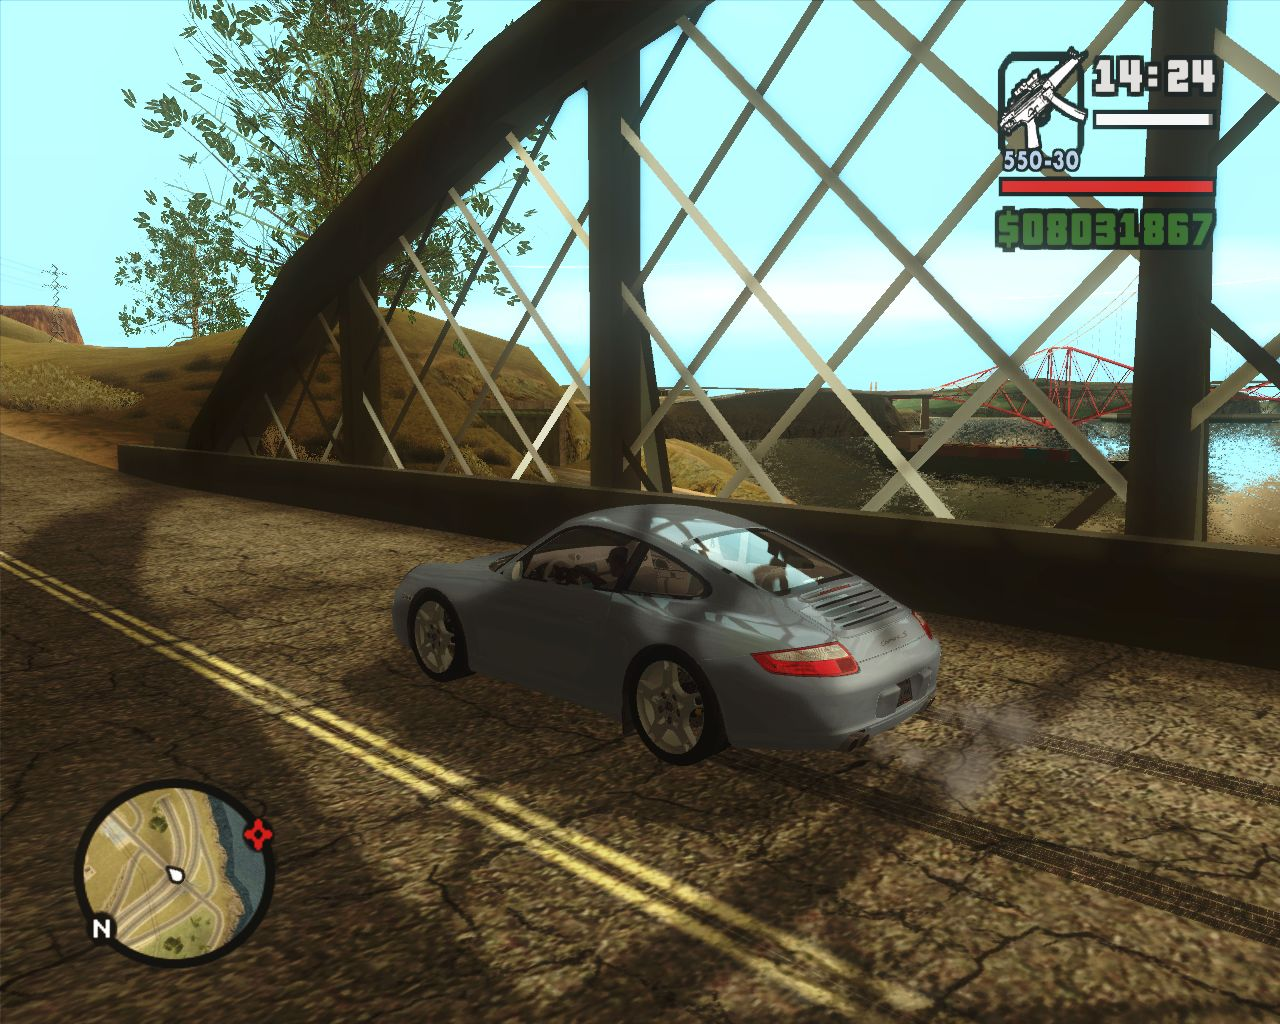 gta_sa 2008-04-12 17-36-25-04.jpg - Grand Theft Auto: San Andreas